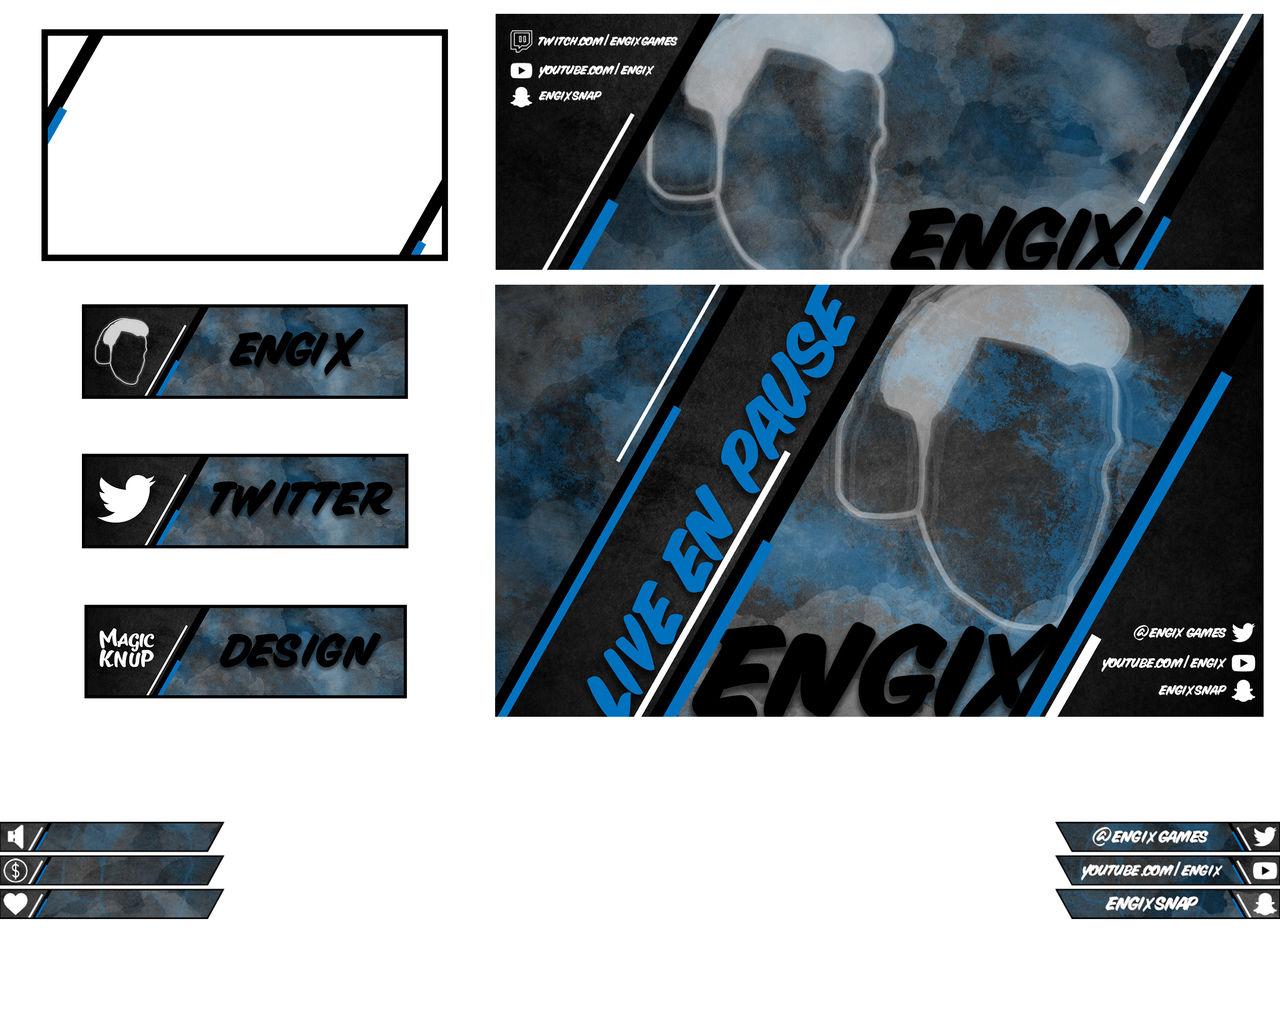 ENGIX (Streamer)